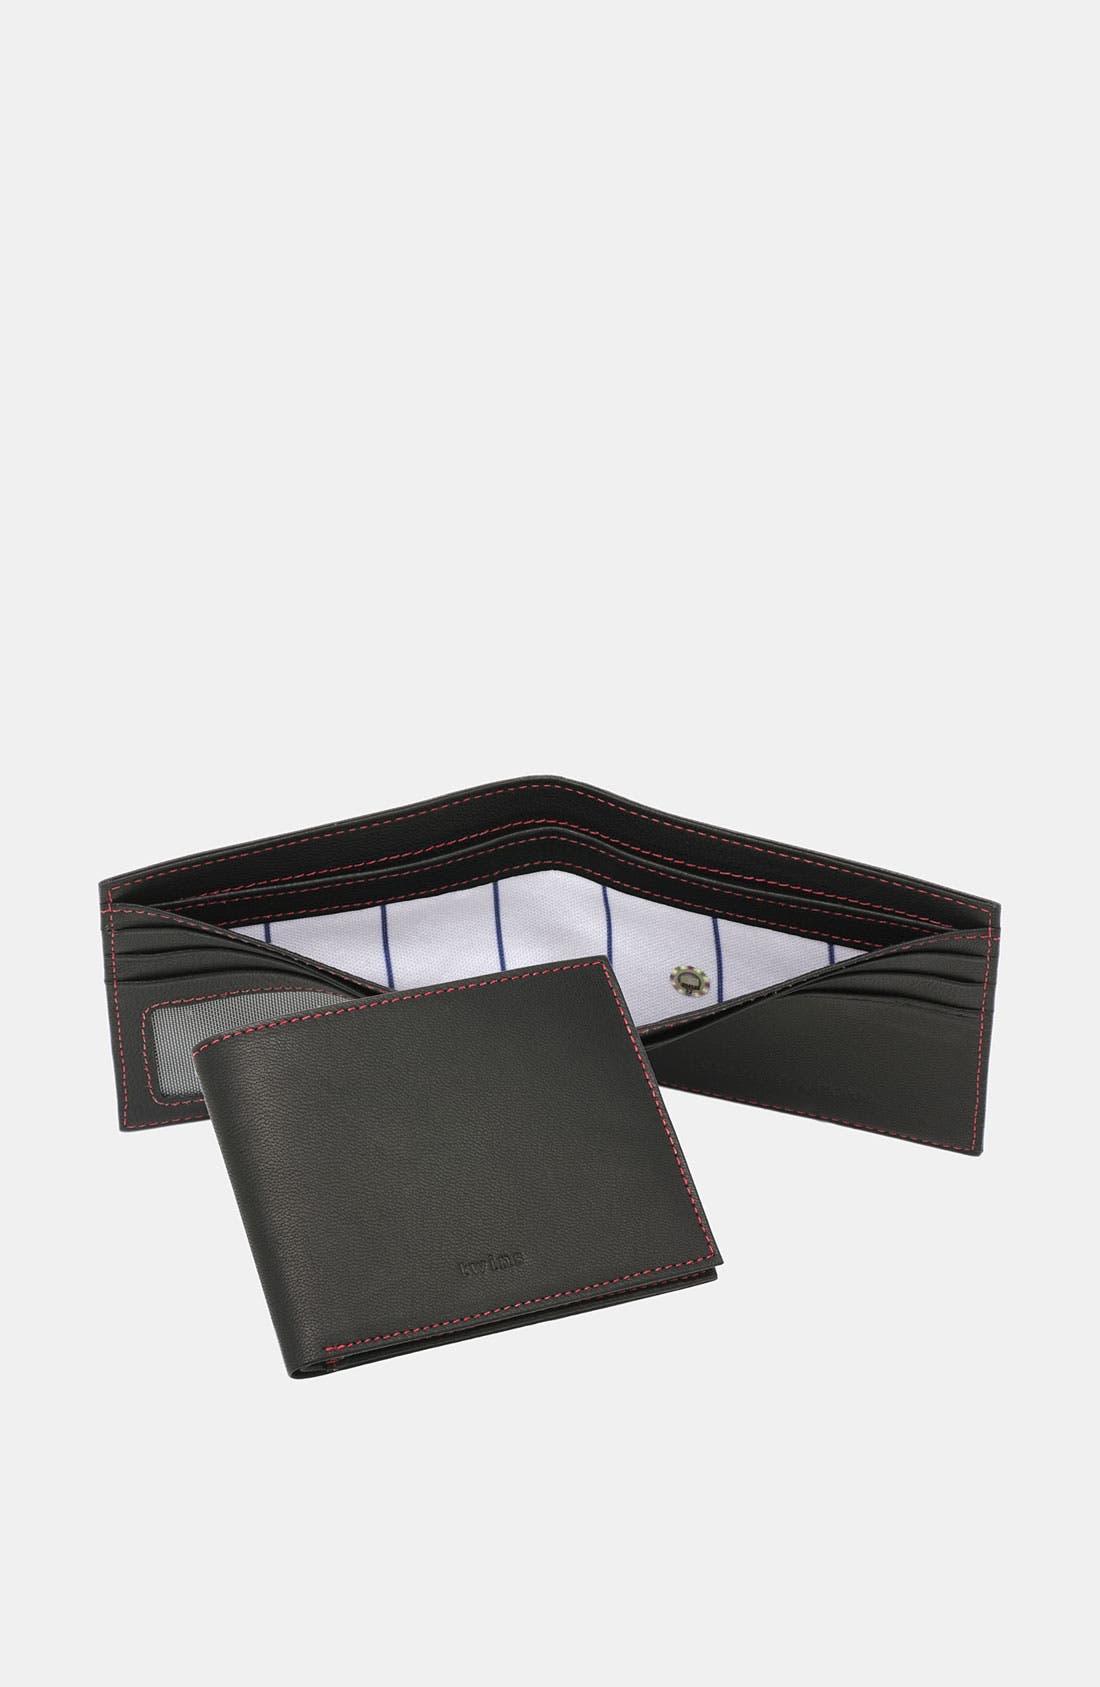 Main Image - Tokens & Icons 'Minnesota Twins' MLB™ Game-Used-Uniform Wallet